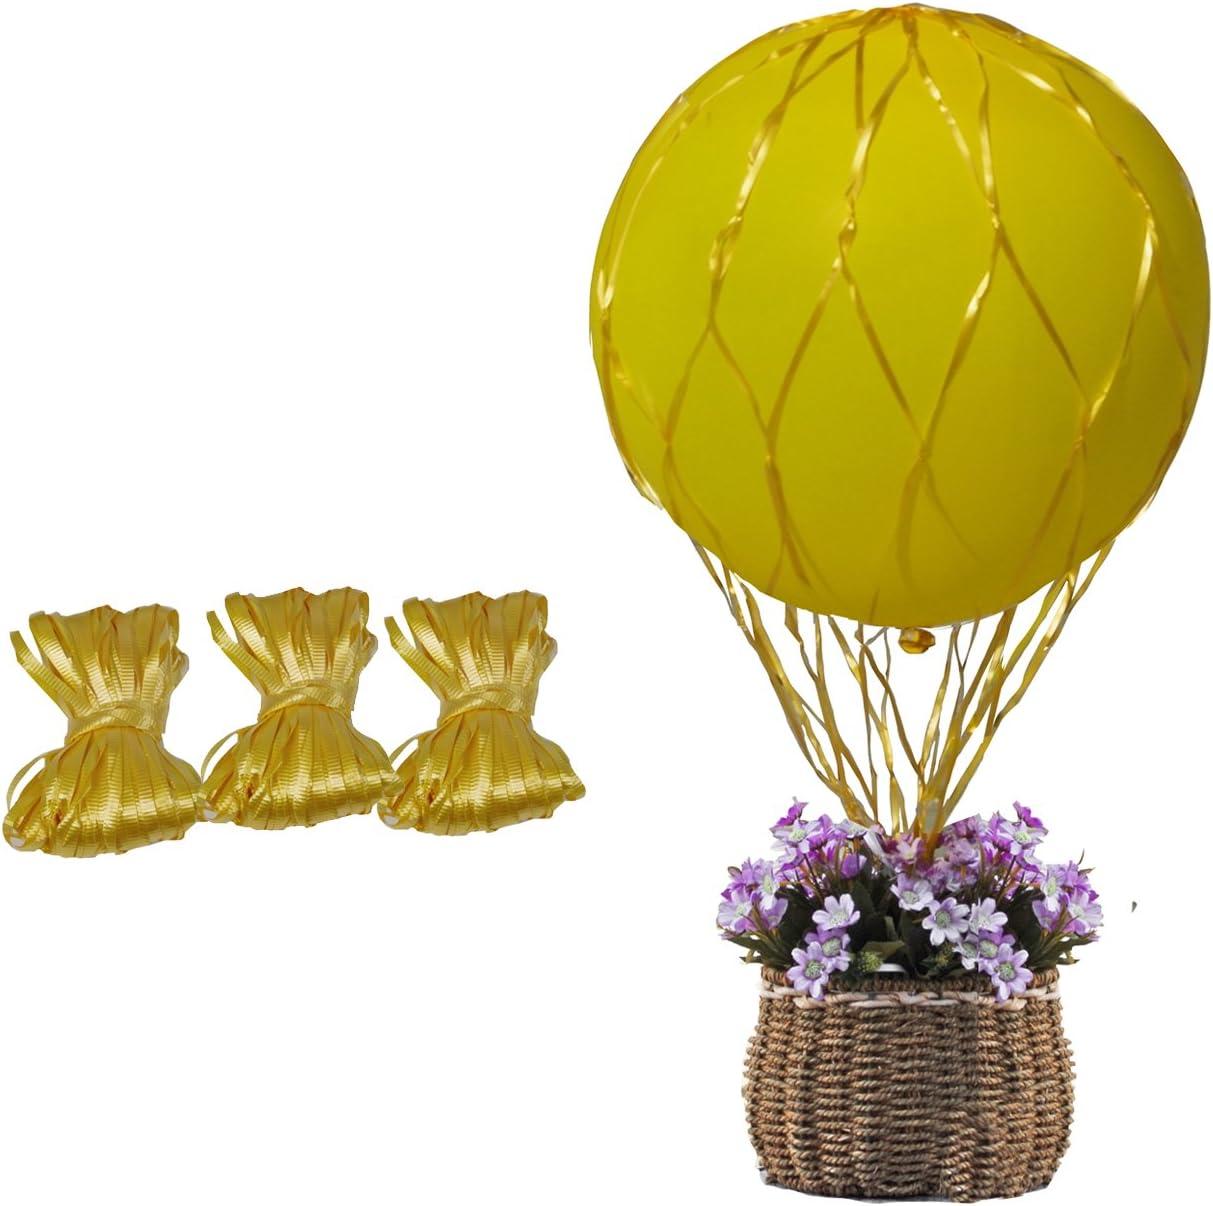 Gold Hot Air Balloon Nets Centerpiece Netting For 36 inch Balloon Centerpieces Arrangements - Pack of 3